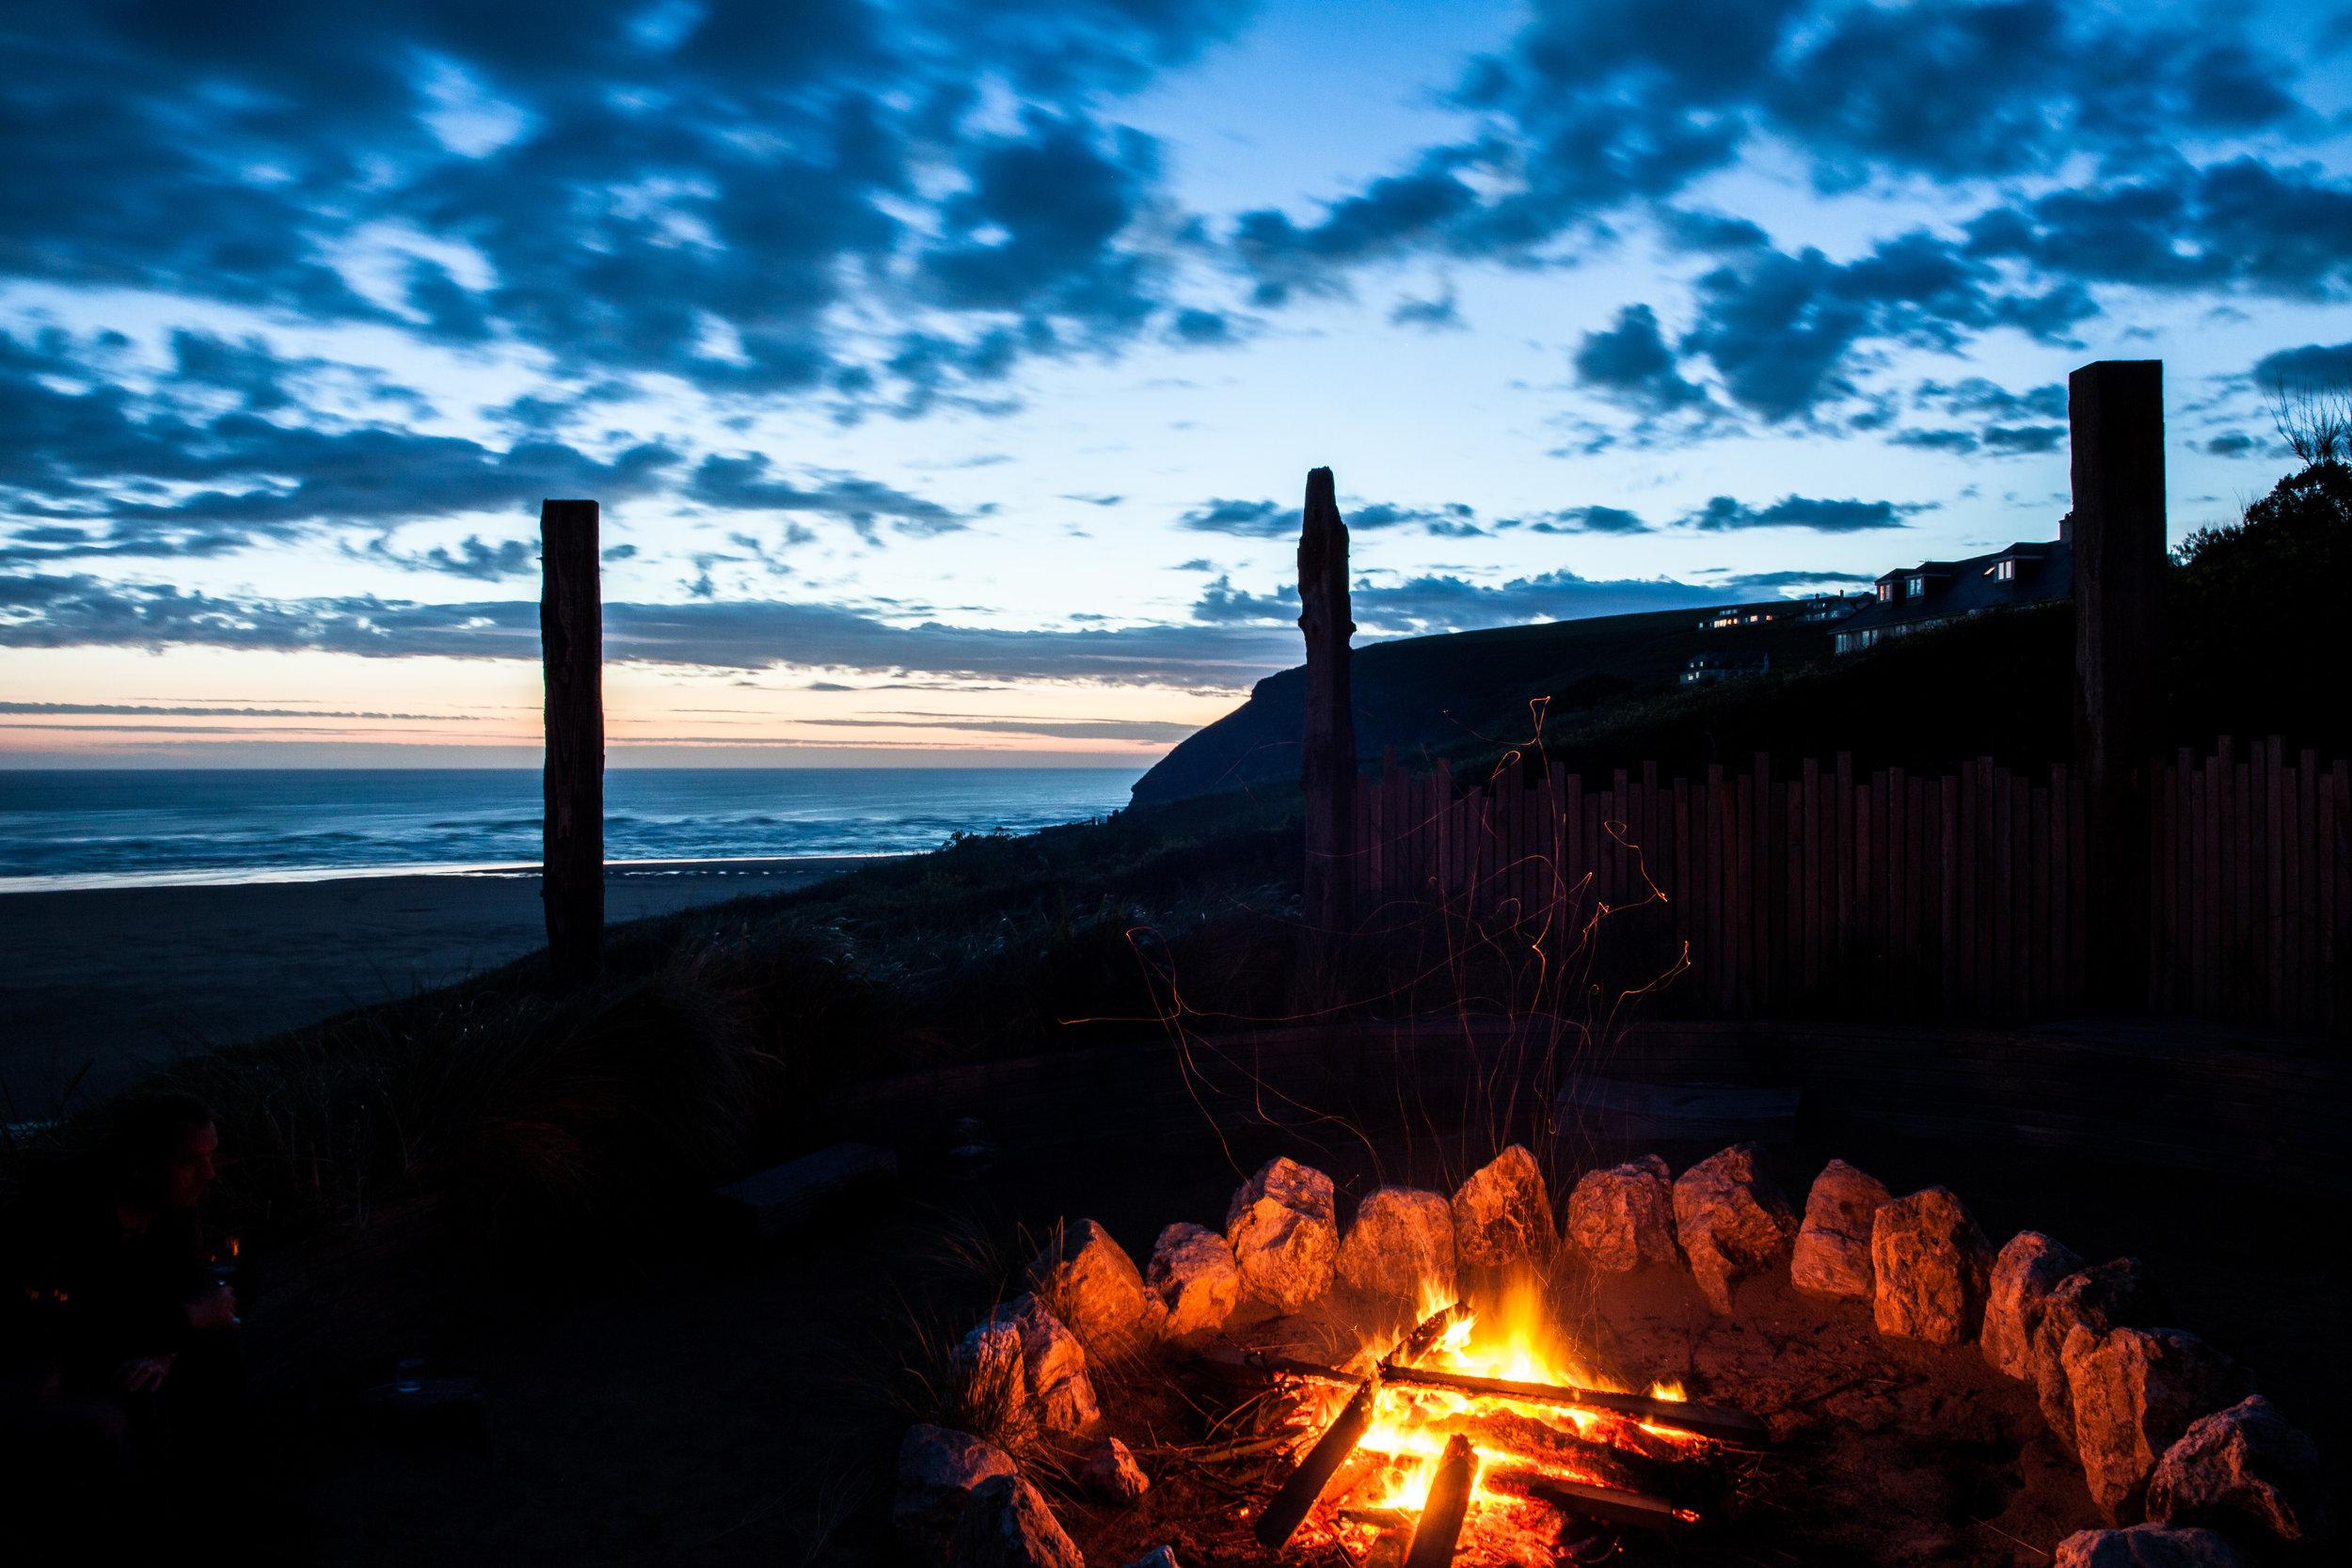 Photo: Matthew Woodget, Fireside Stories, Cornwall UK